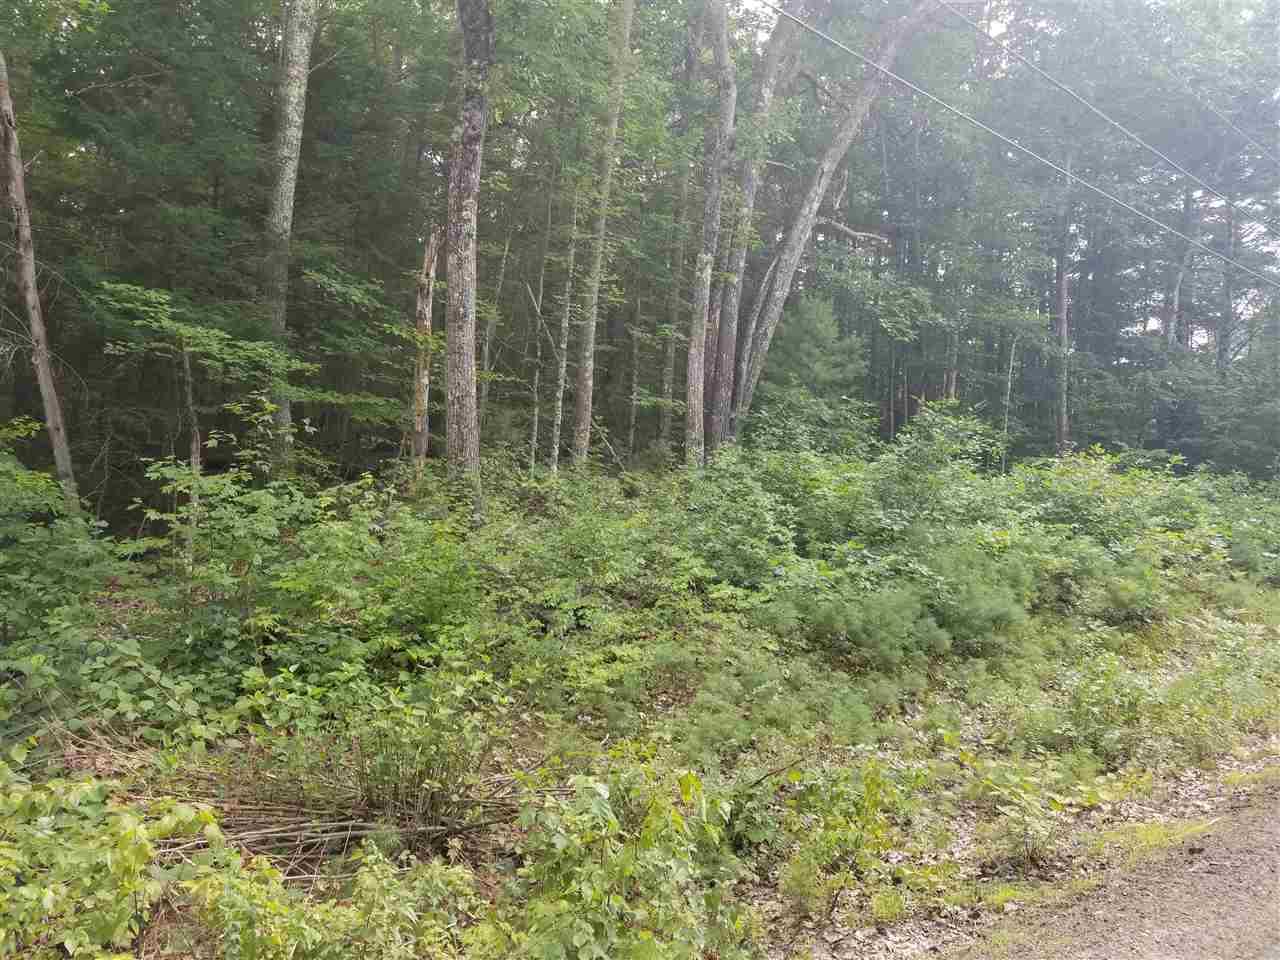 MLS 4723603: Lot 34a Forest Pond, New Hampton NH